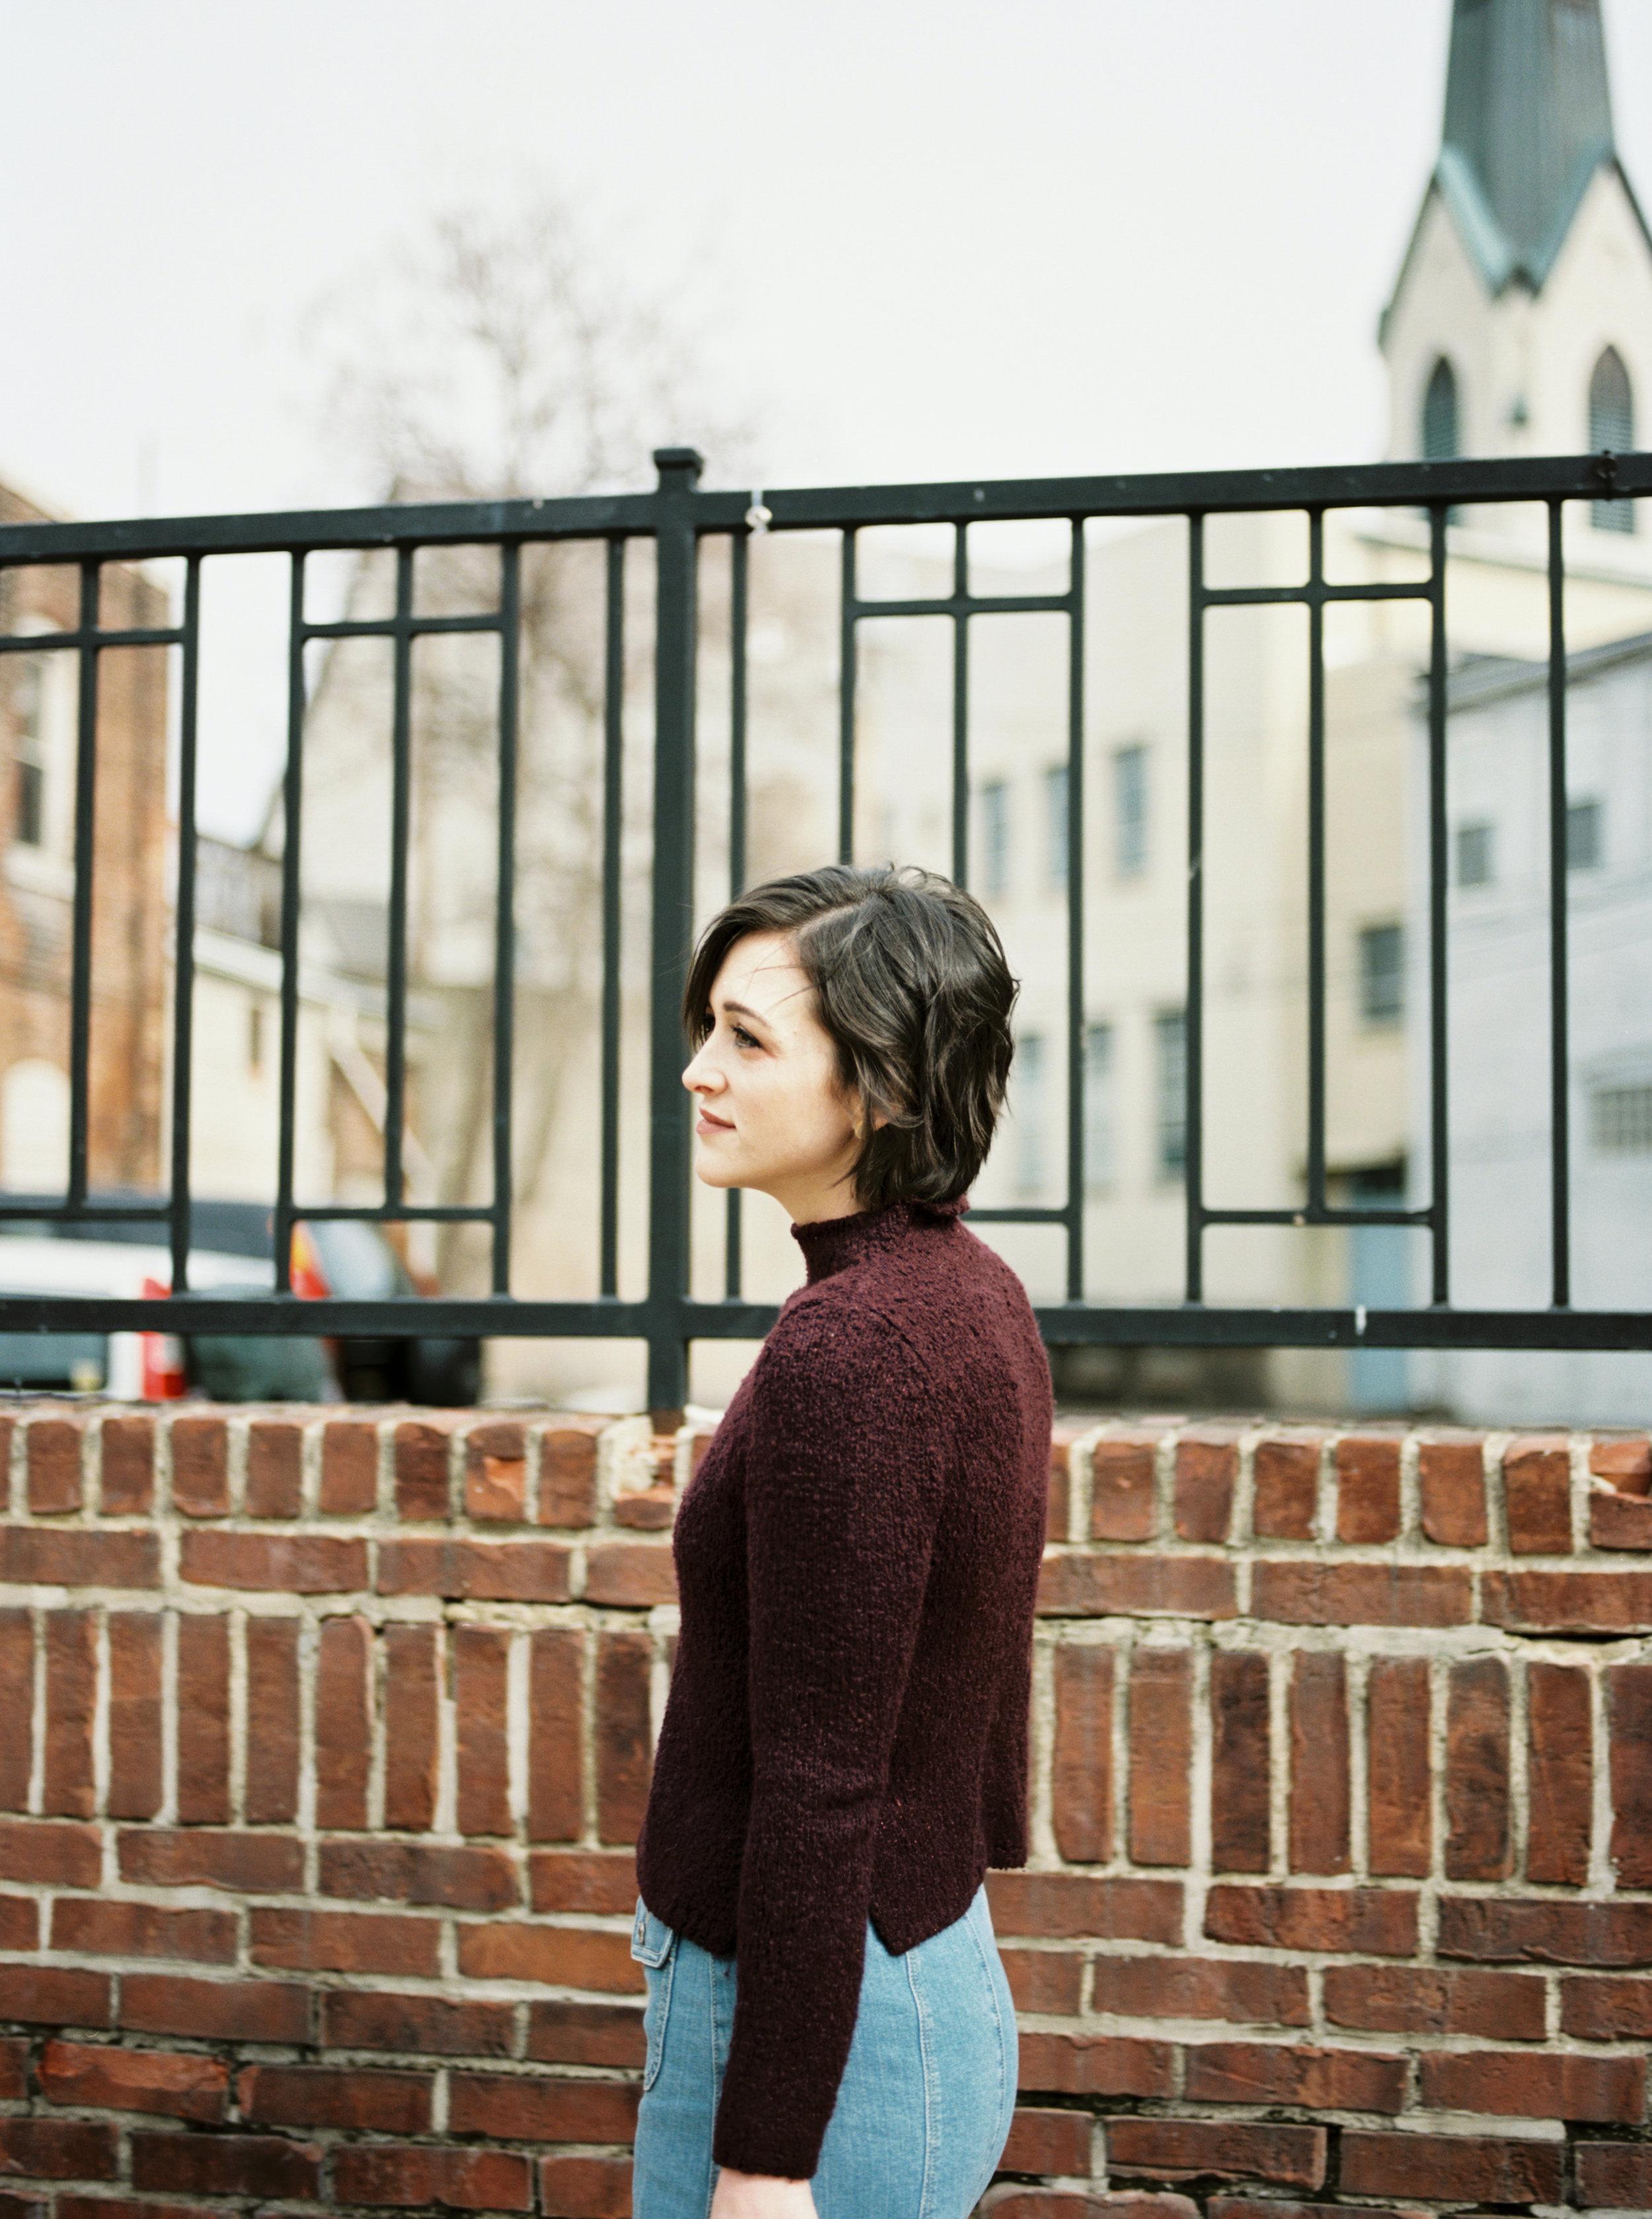 Dayton_Ohio_Cincinnati_Columbus_Cleveland_Film_Portrait_Photographer_Tonya_Espy-54.jpg